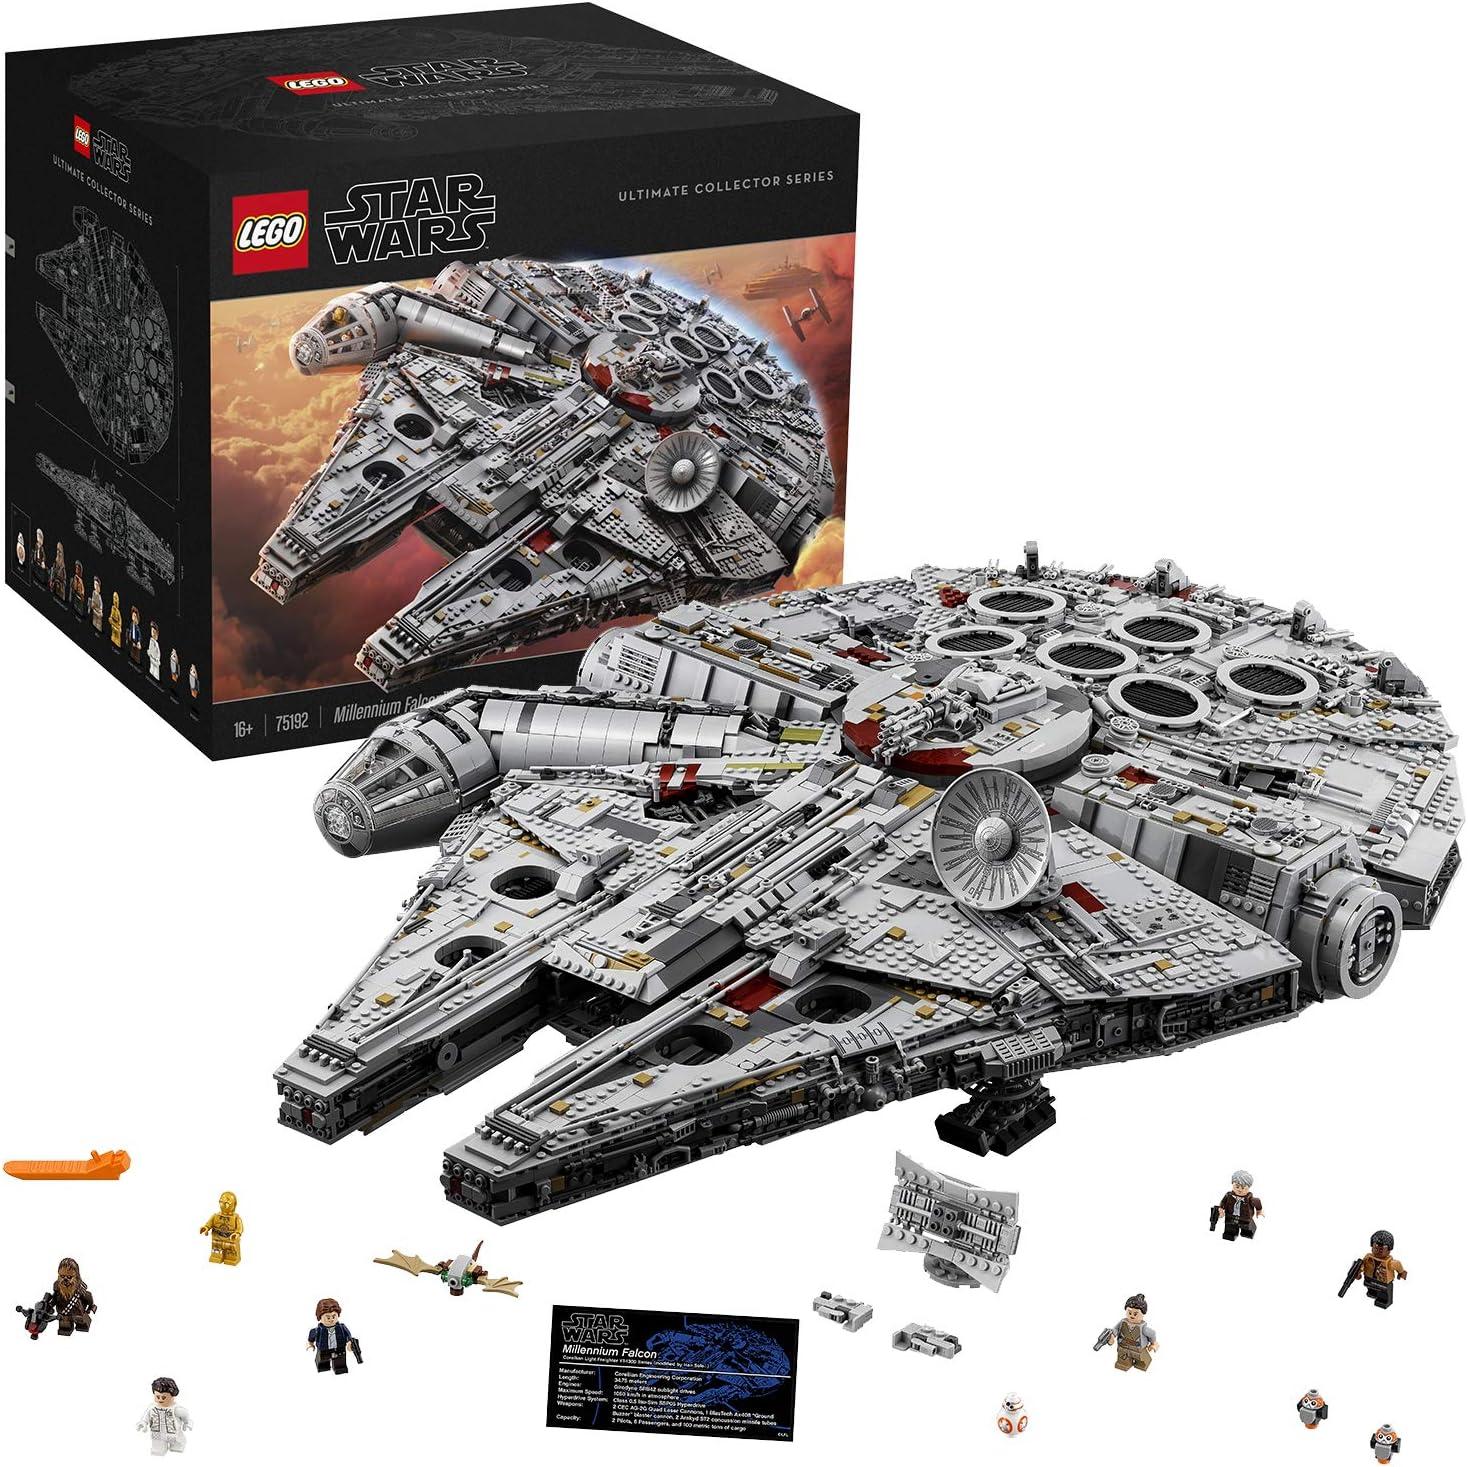 Star Wars Lego Millennium Falcon Ultimate Collector Series 75192 Spielzeug